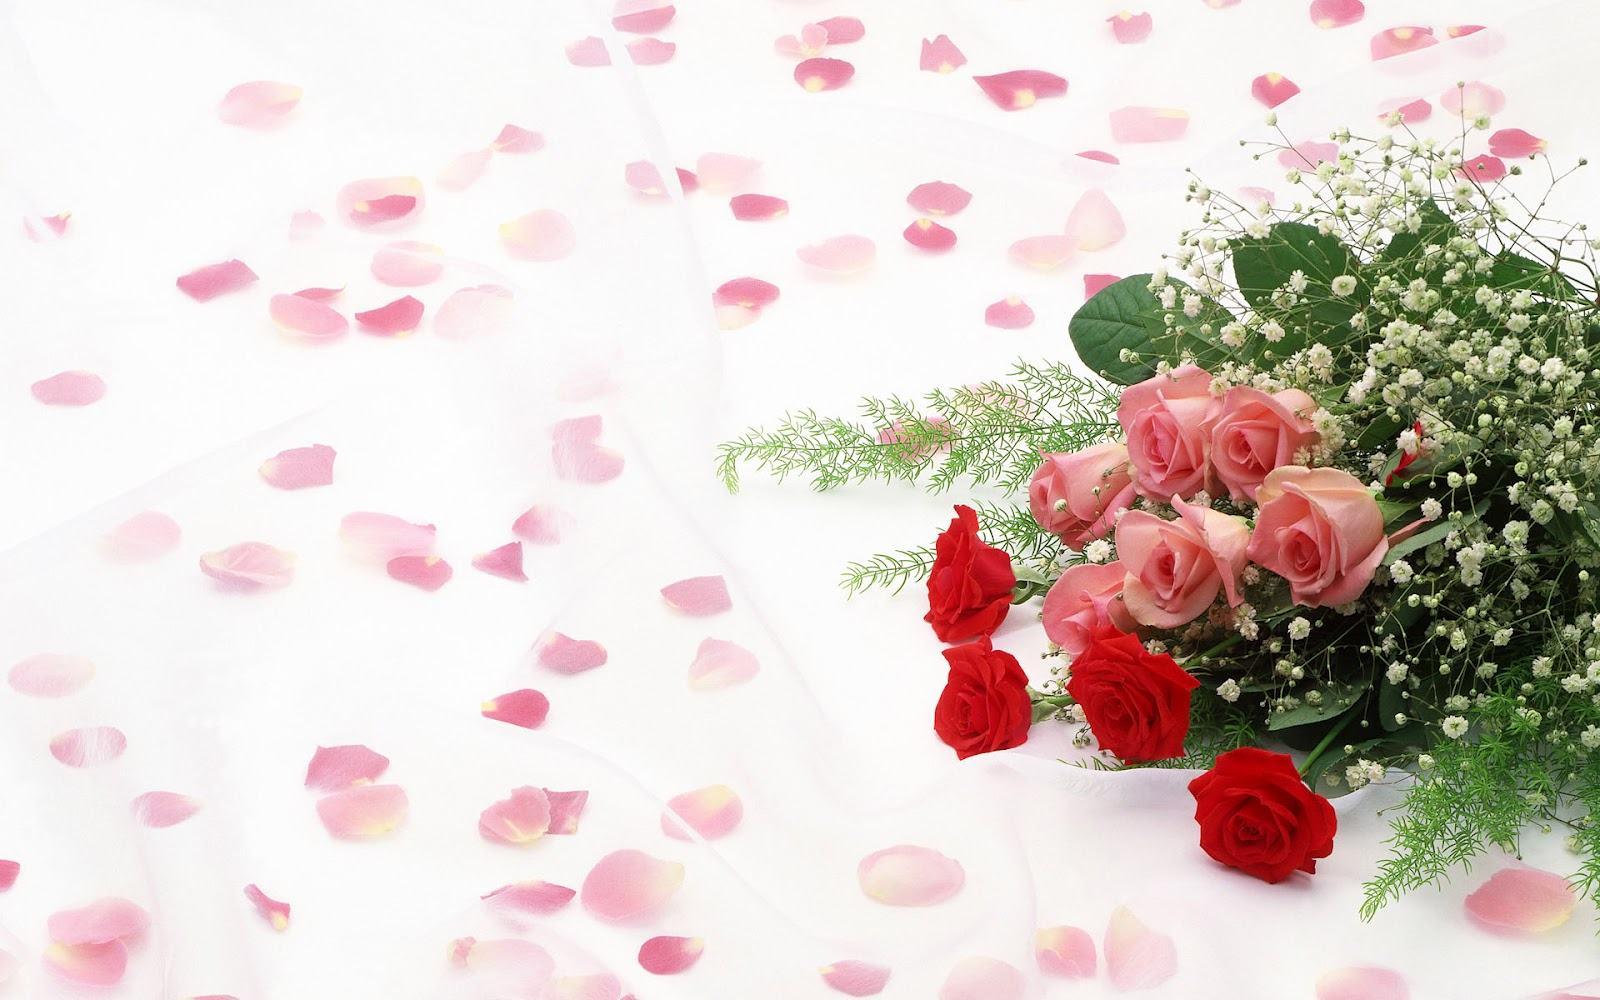 Background Roses Wallpaper Sf Wallpaper